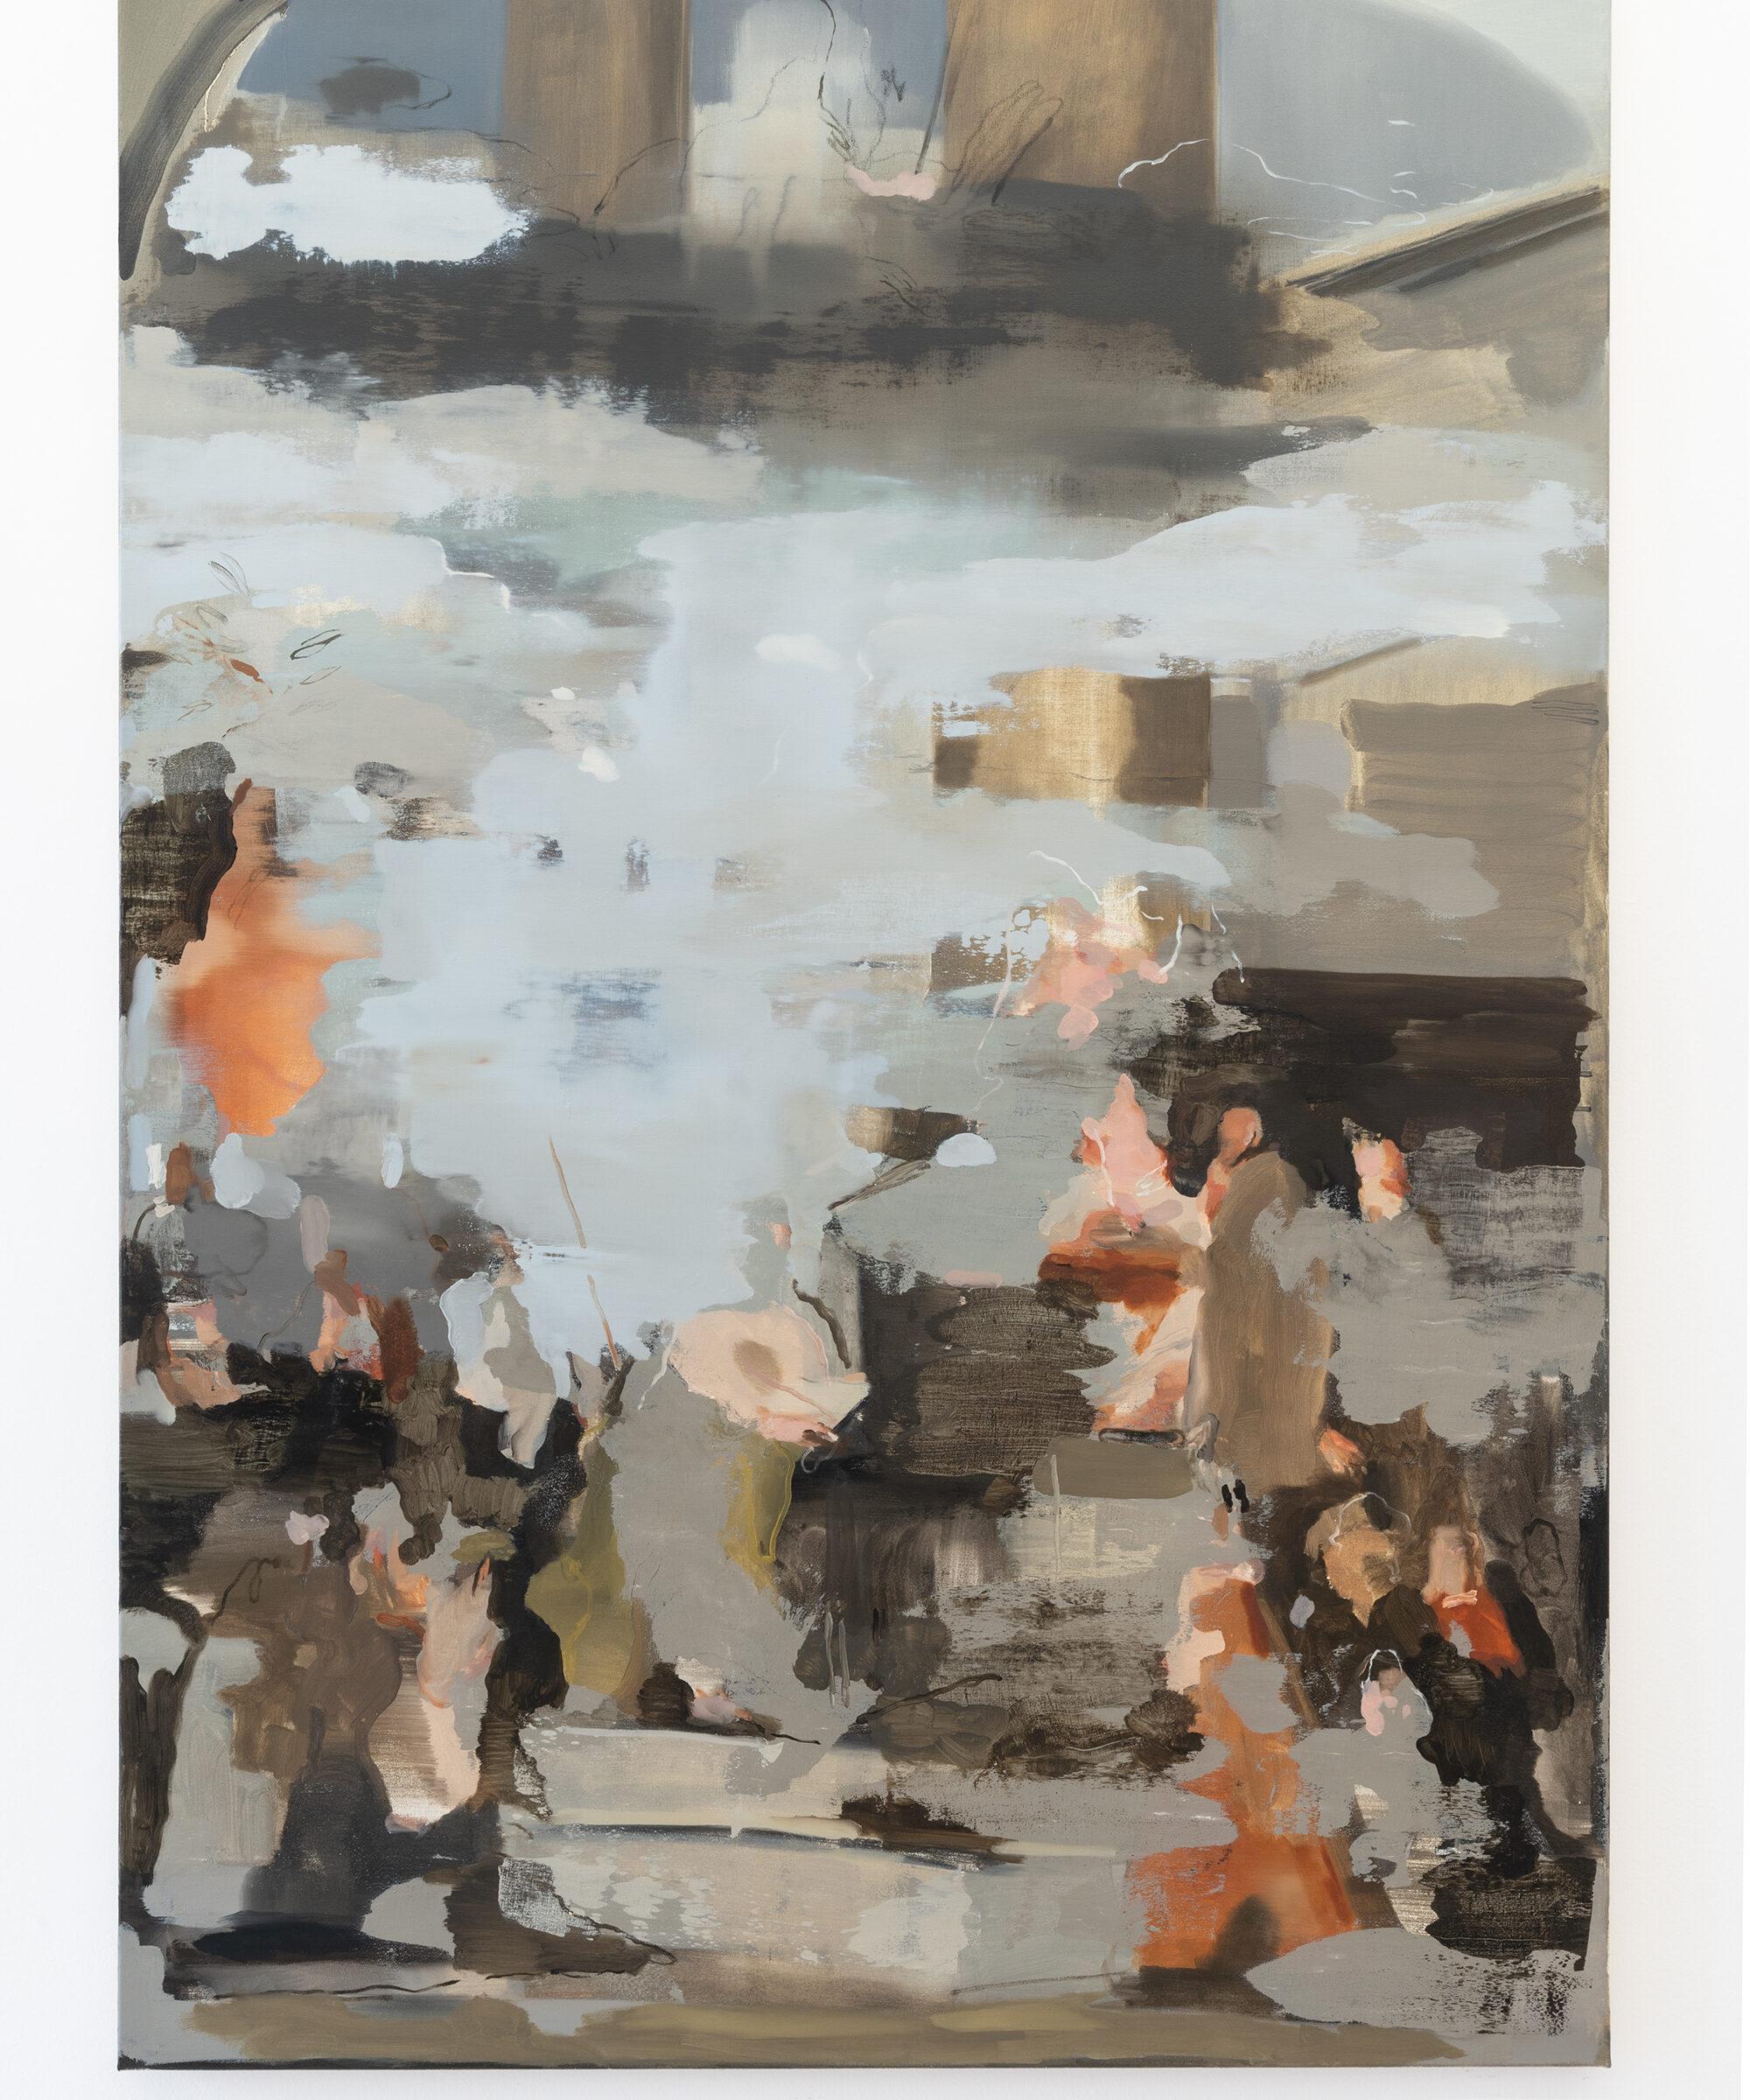 20. Nazzarena Poli Maramotti, Tiziano, Pala Pesaro, oil on canvas, 175x125cm